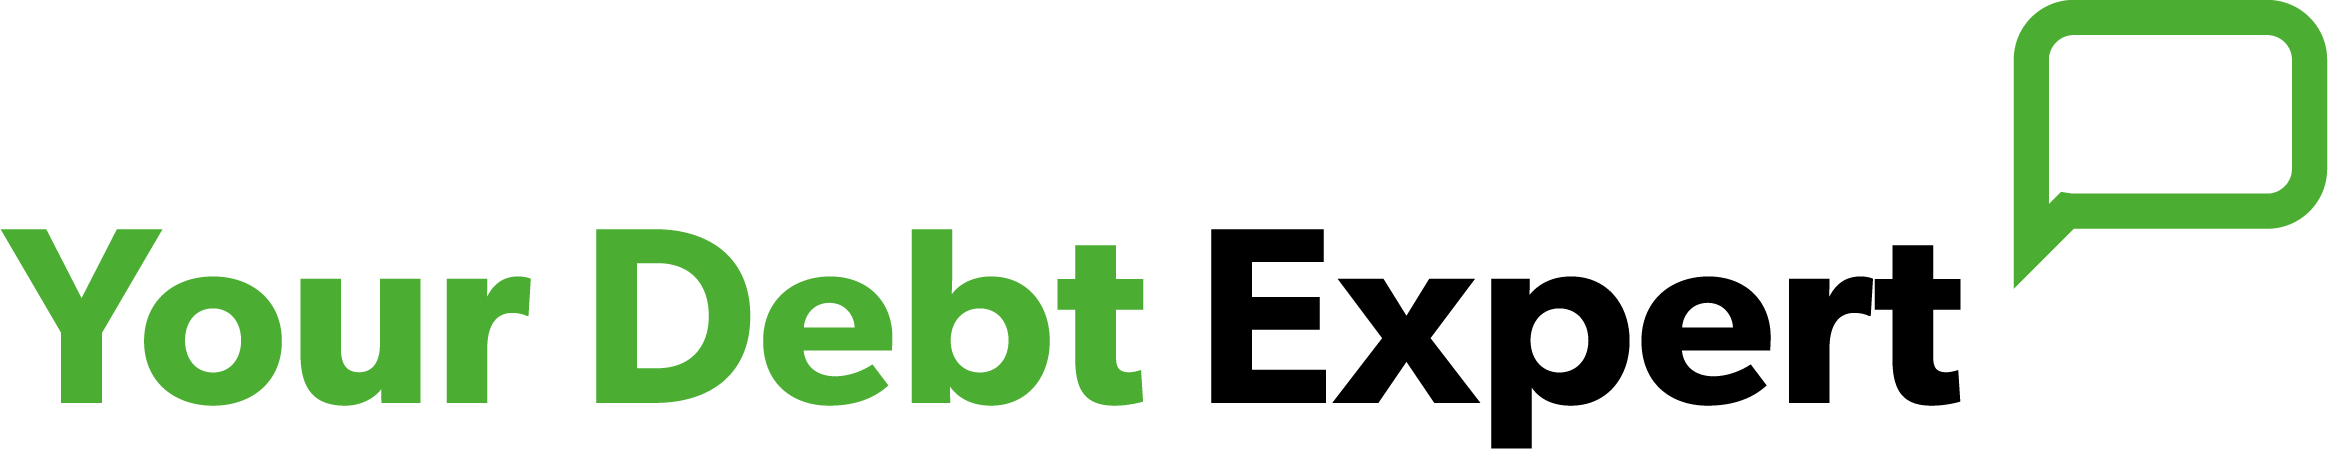 Your Debt Expert Logo